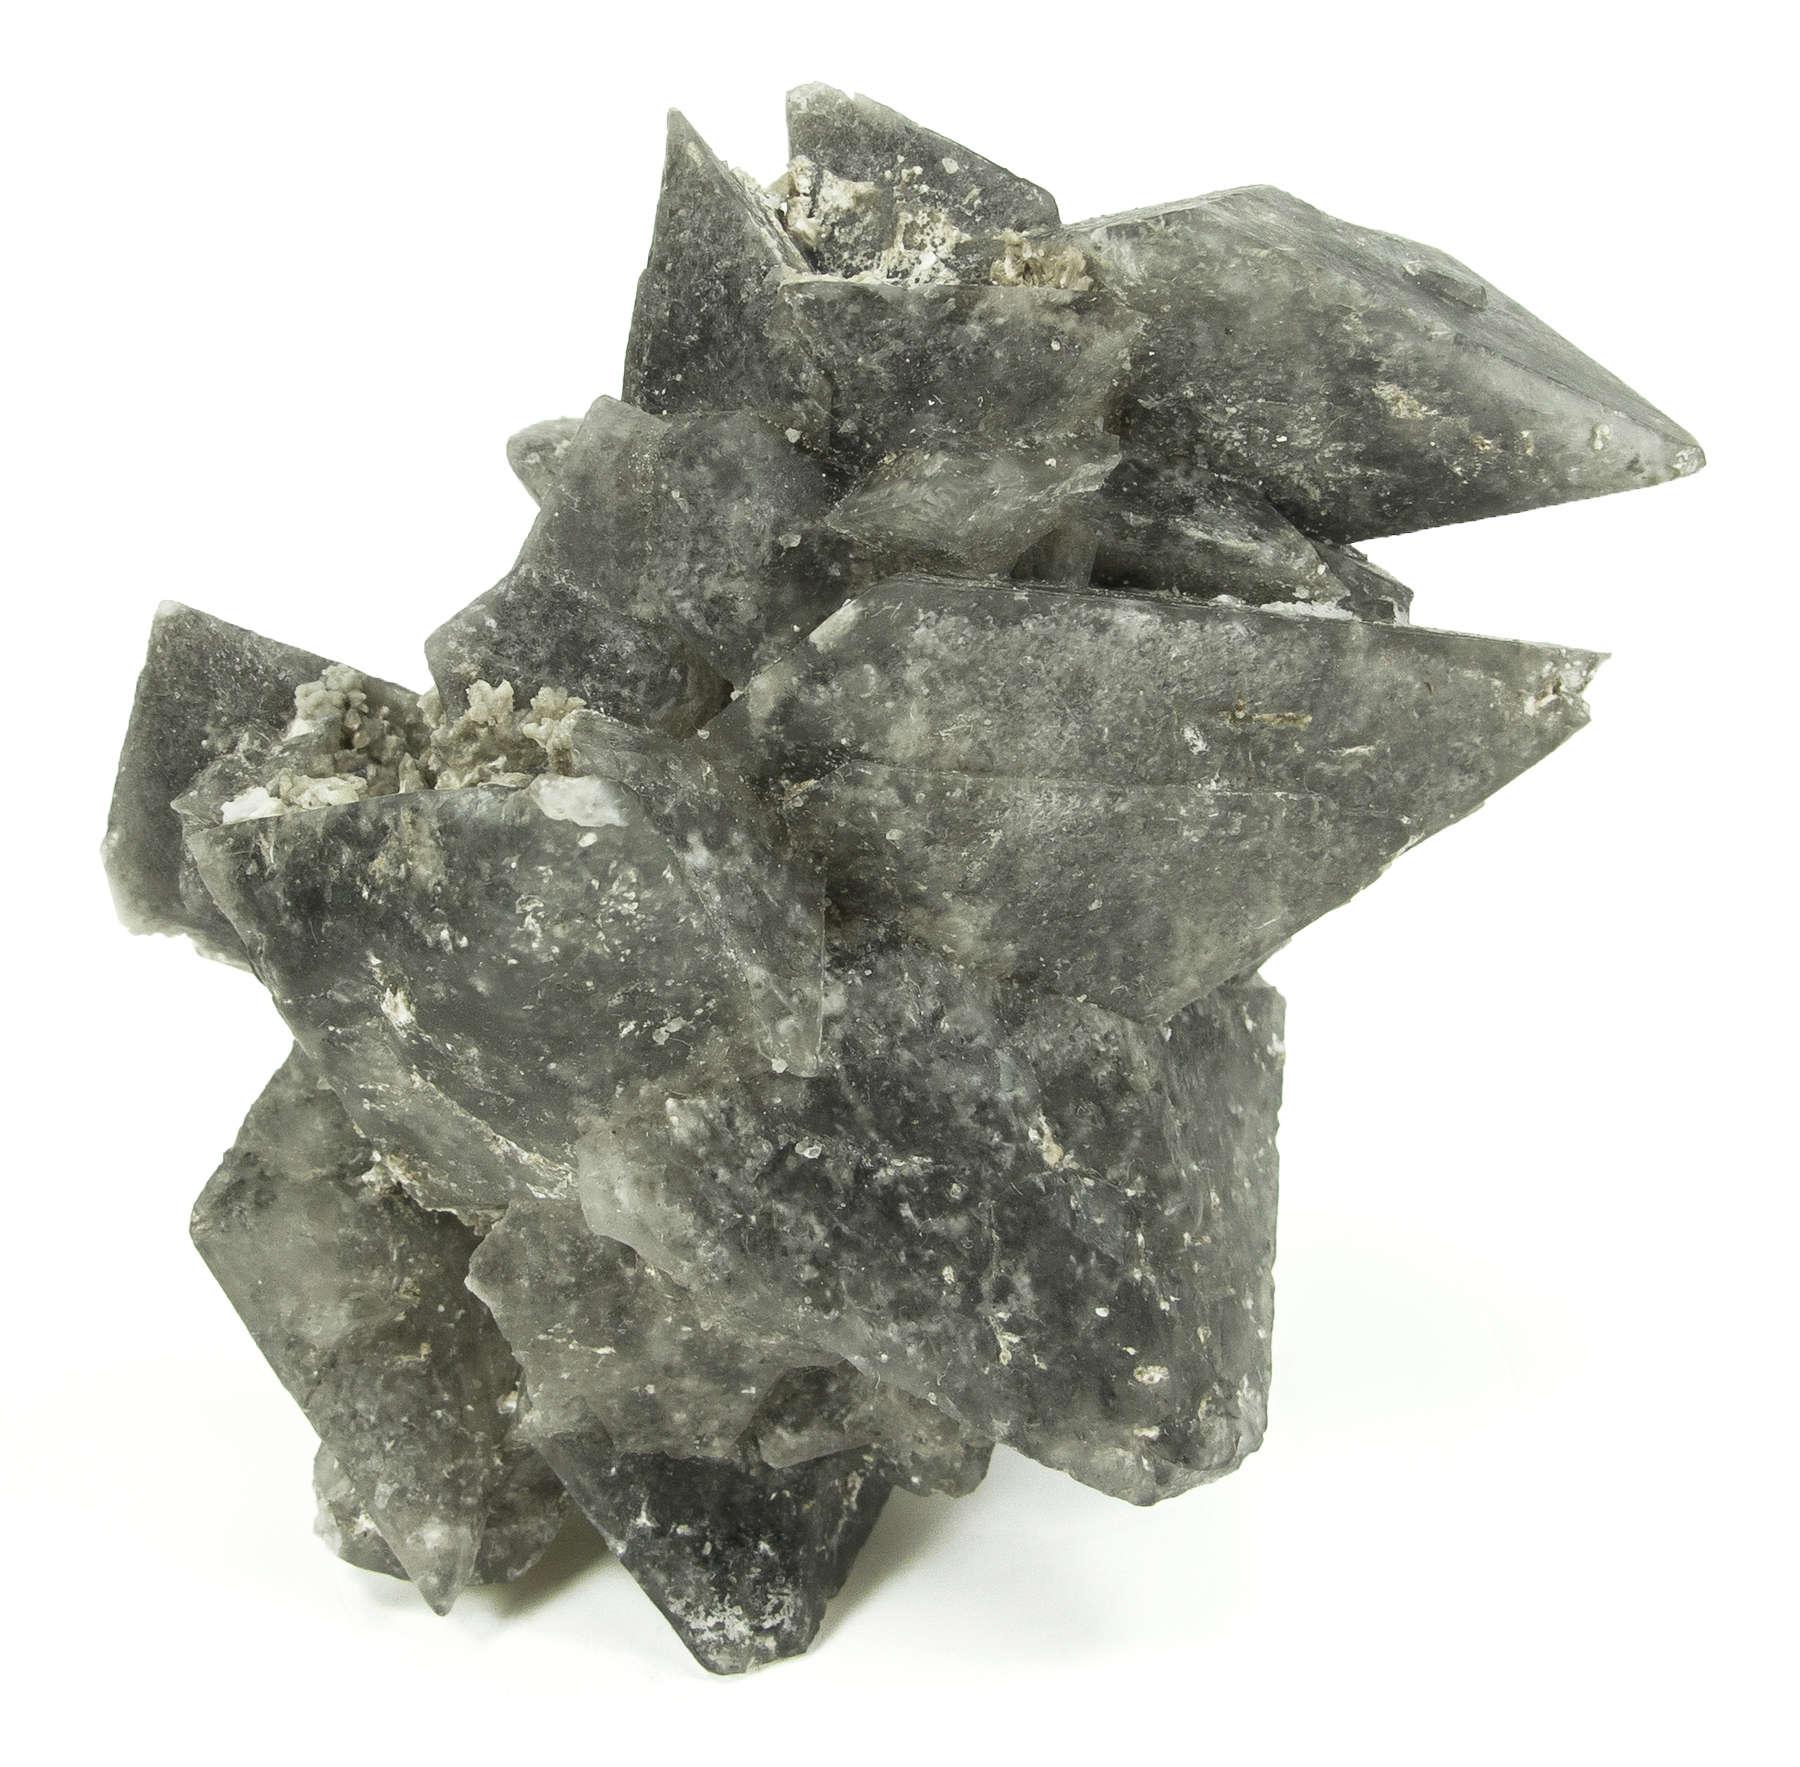 A aesthetic sharp cluster bipyramidal crystals thenardite rare sodium